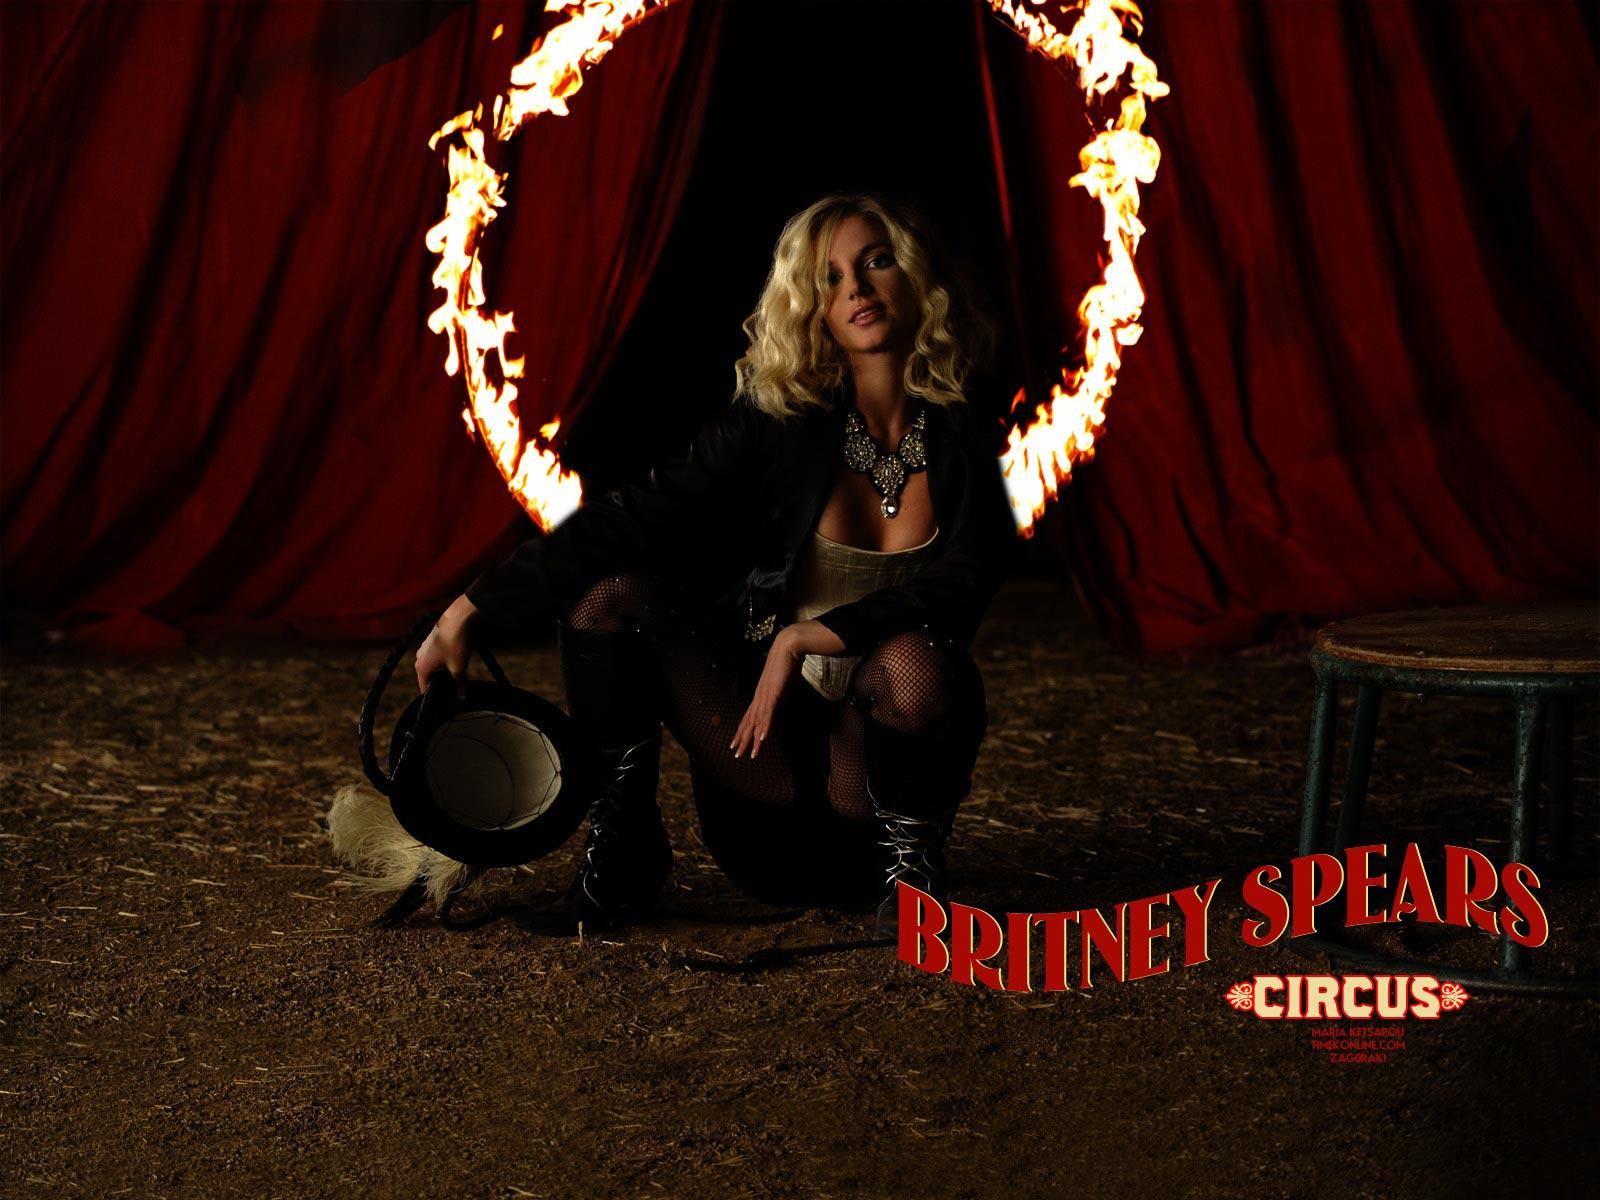 http://3.bp.blogspot.com/-VszJH95It4g/UAmtjxficdI/AAAAAAAAAC4/yo2SepETeqs/s1600/Britney-Spears-Circus-1600x1200-Wallpaper.jpeg